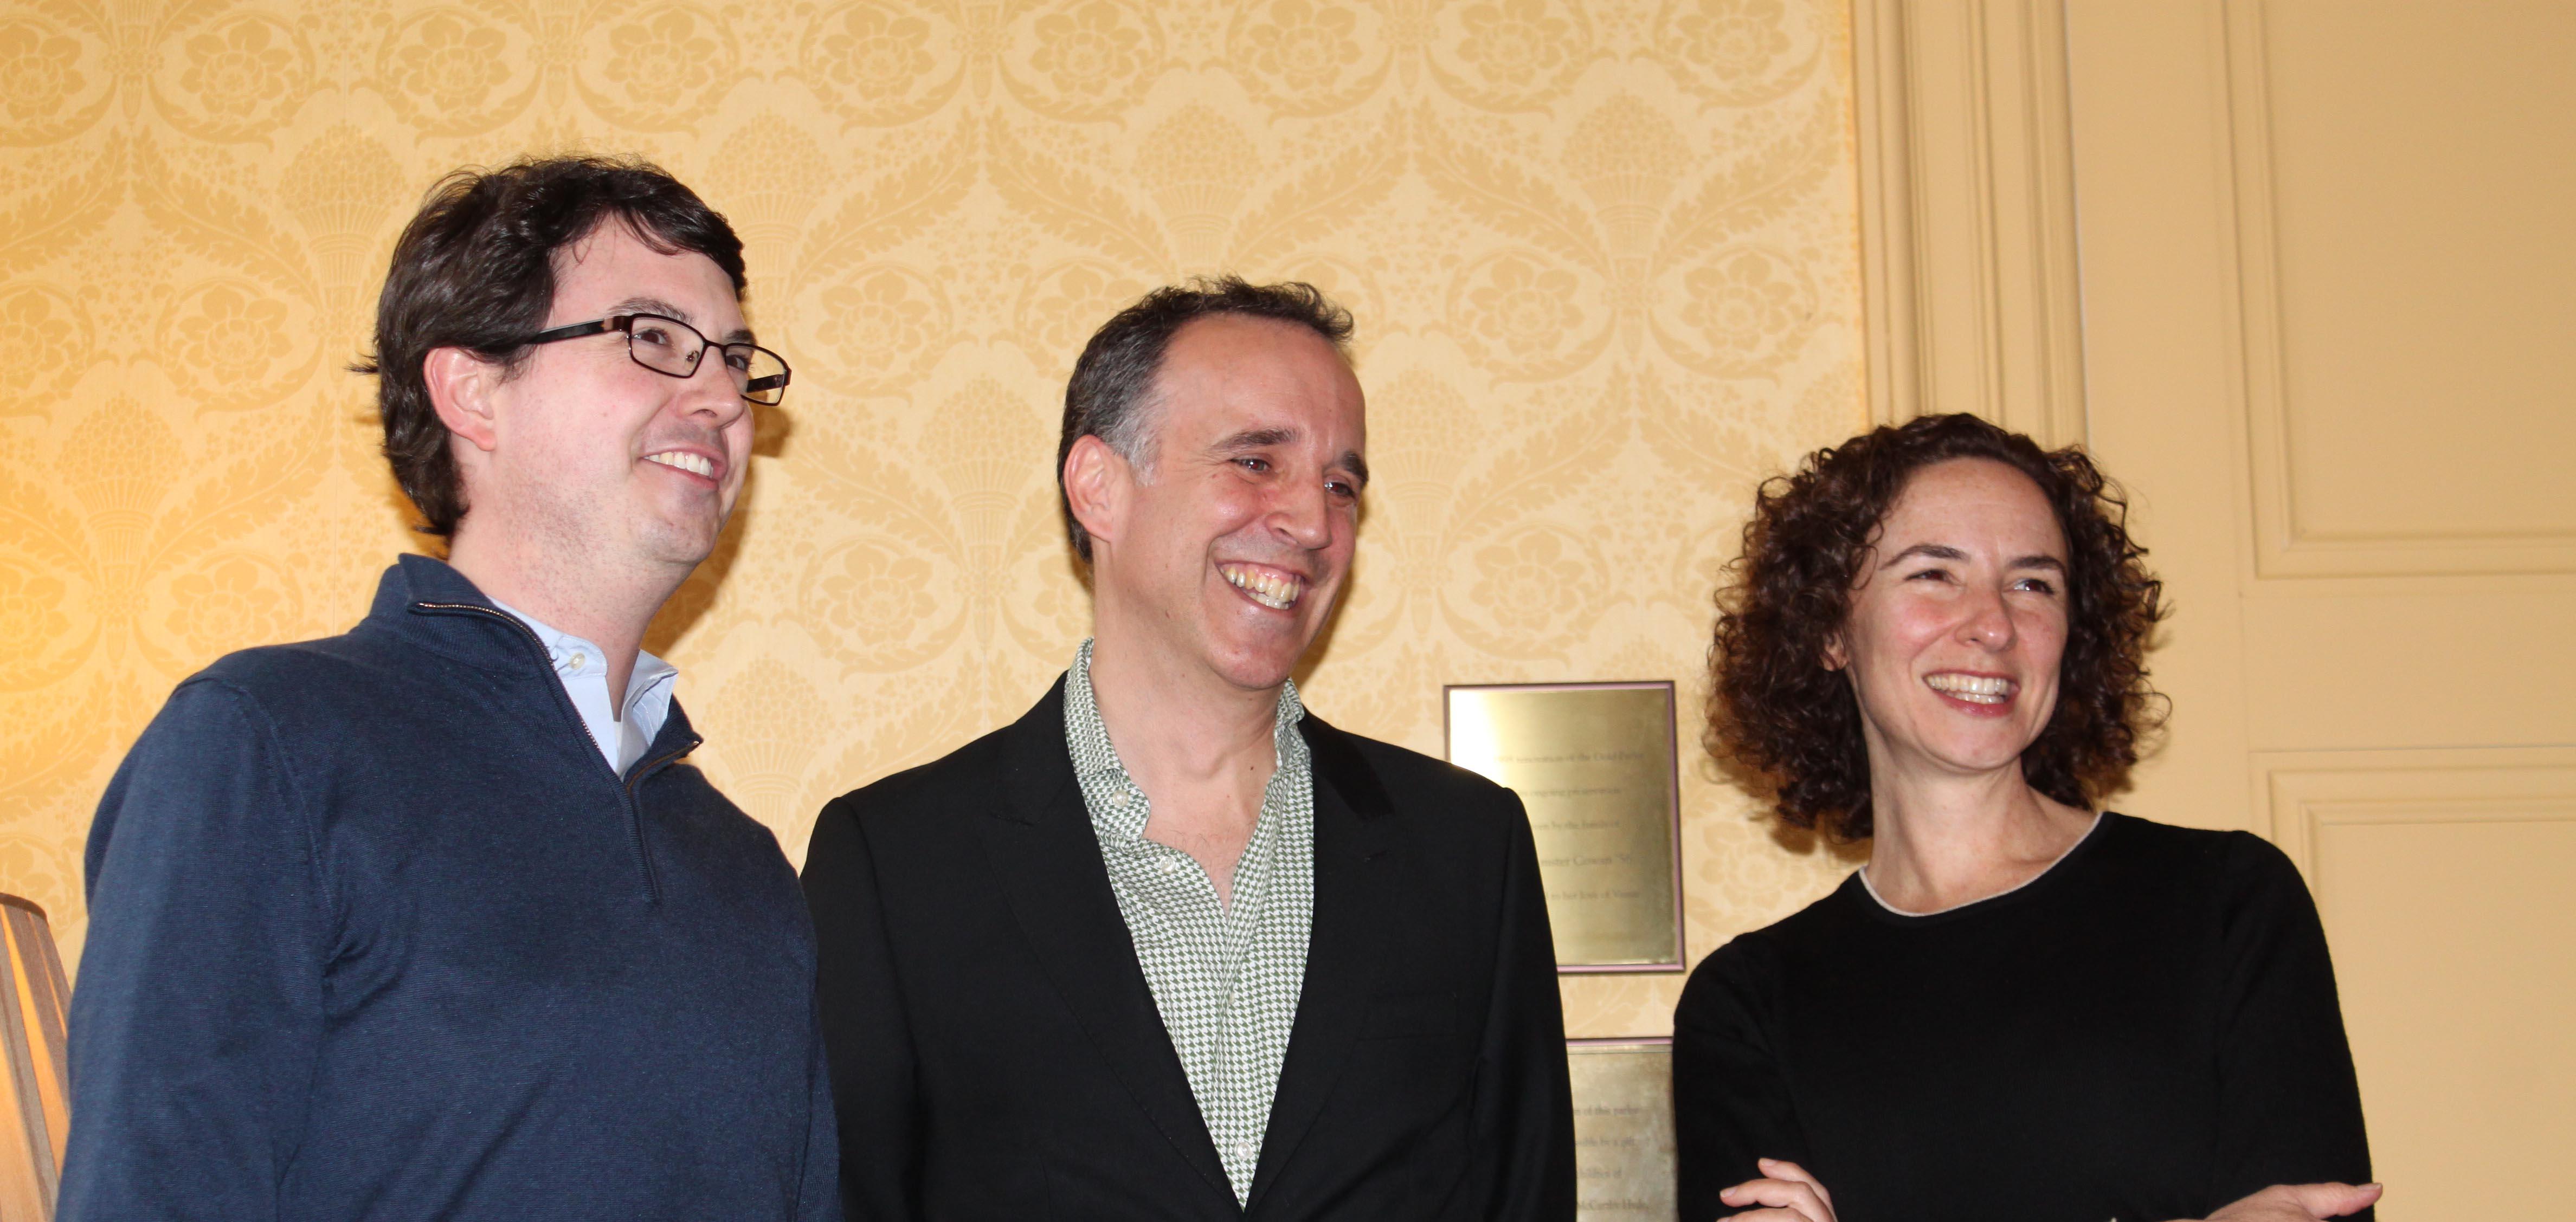 (L to R): Thomas Pearson, Edward Cheetham, Johanna Pfaelzer